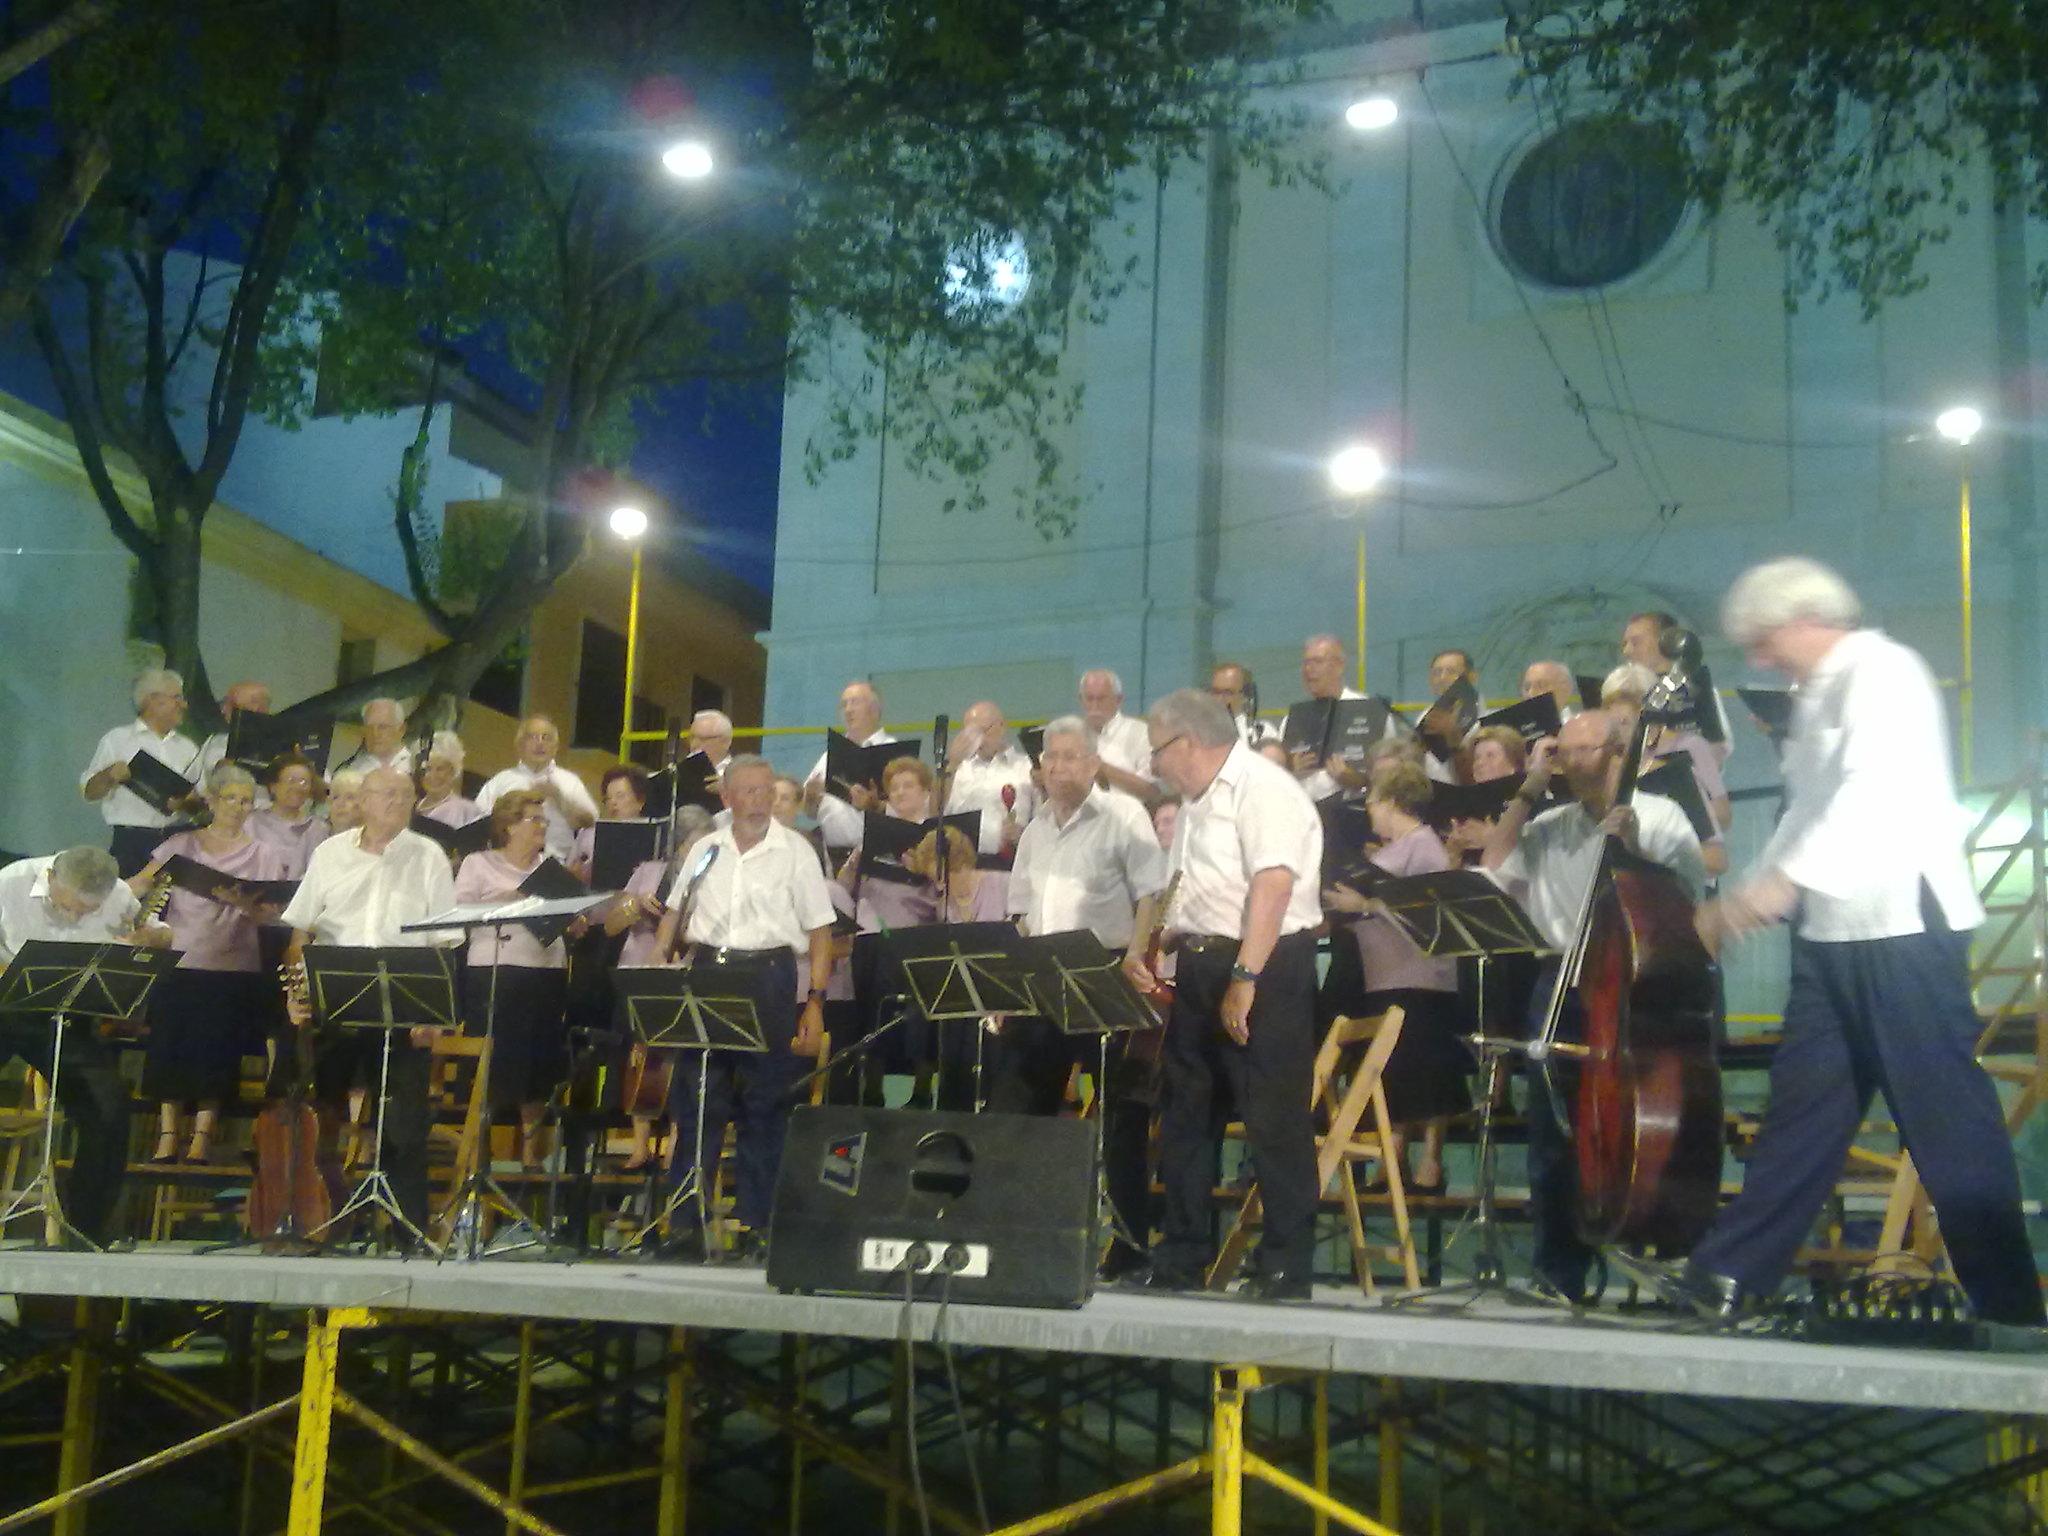 (2012-06-29) - Cocierto Rondalla CEAM - José vicente Romero Ripoll (08)